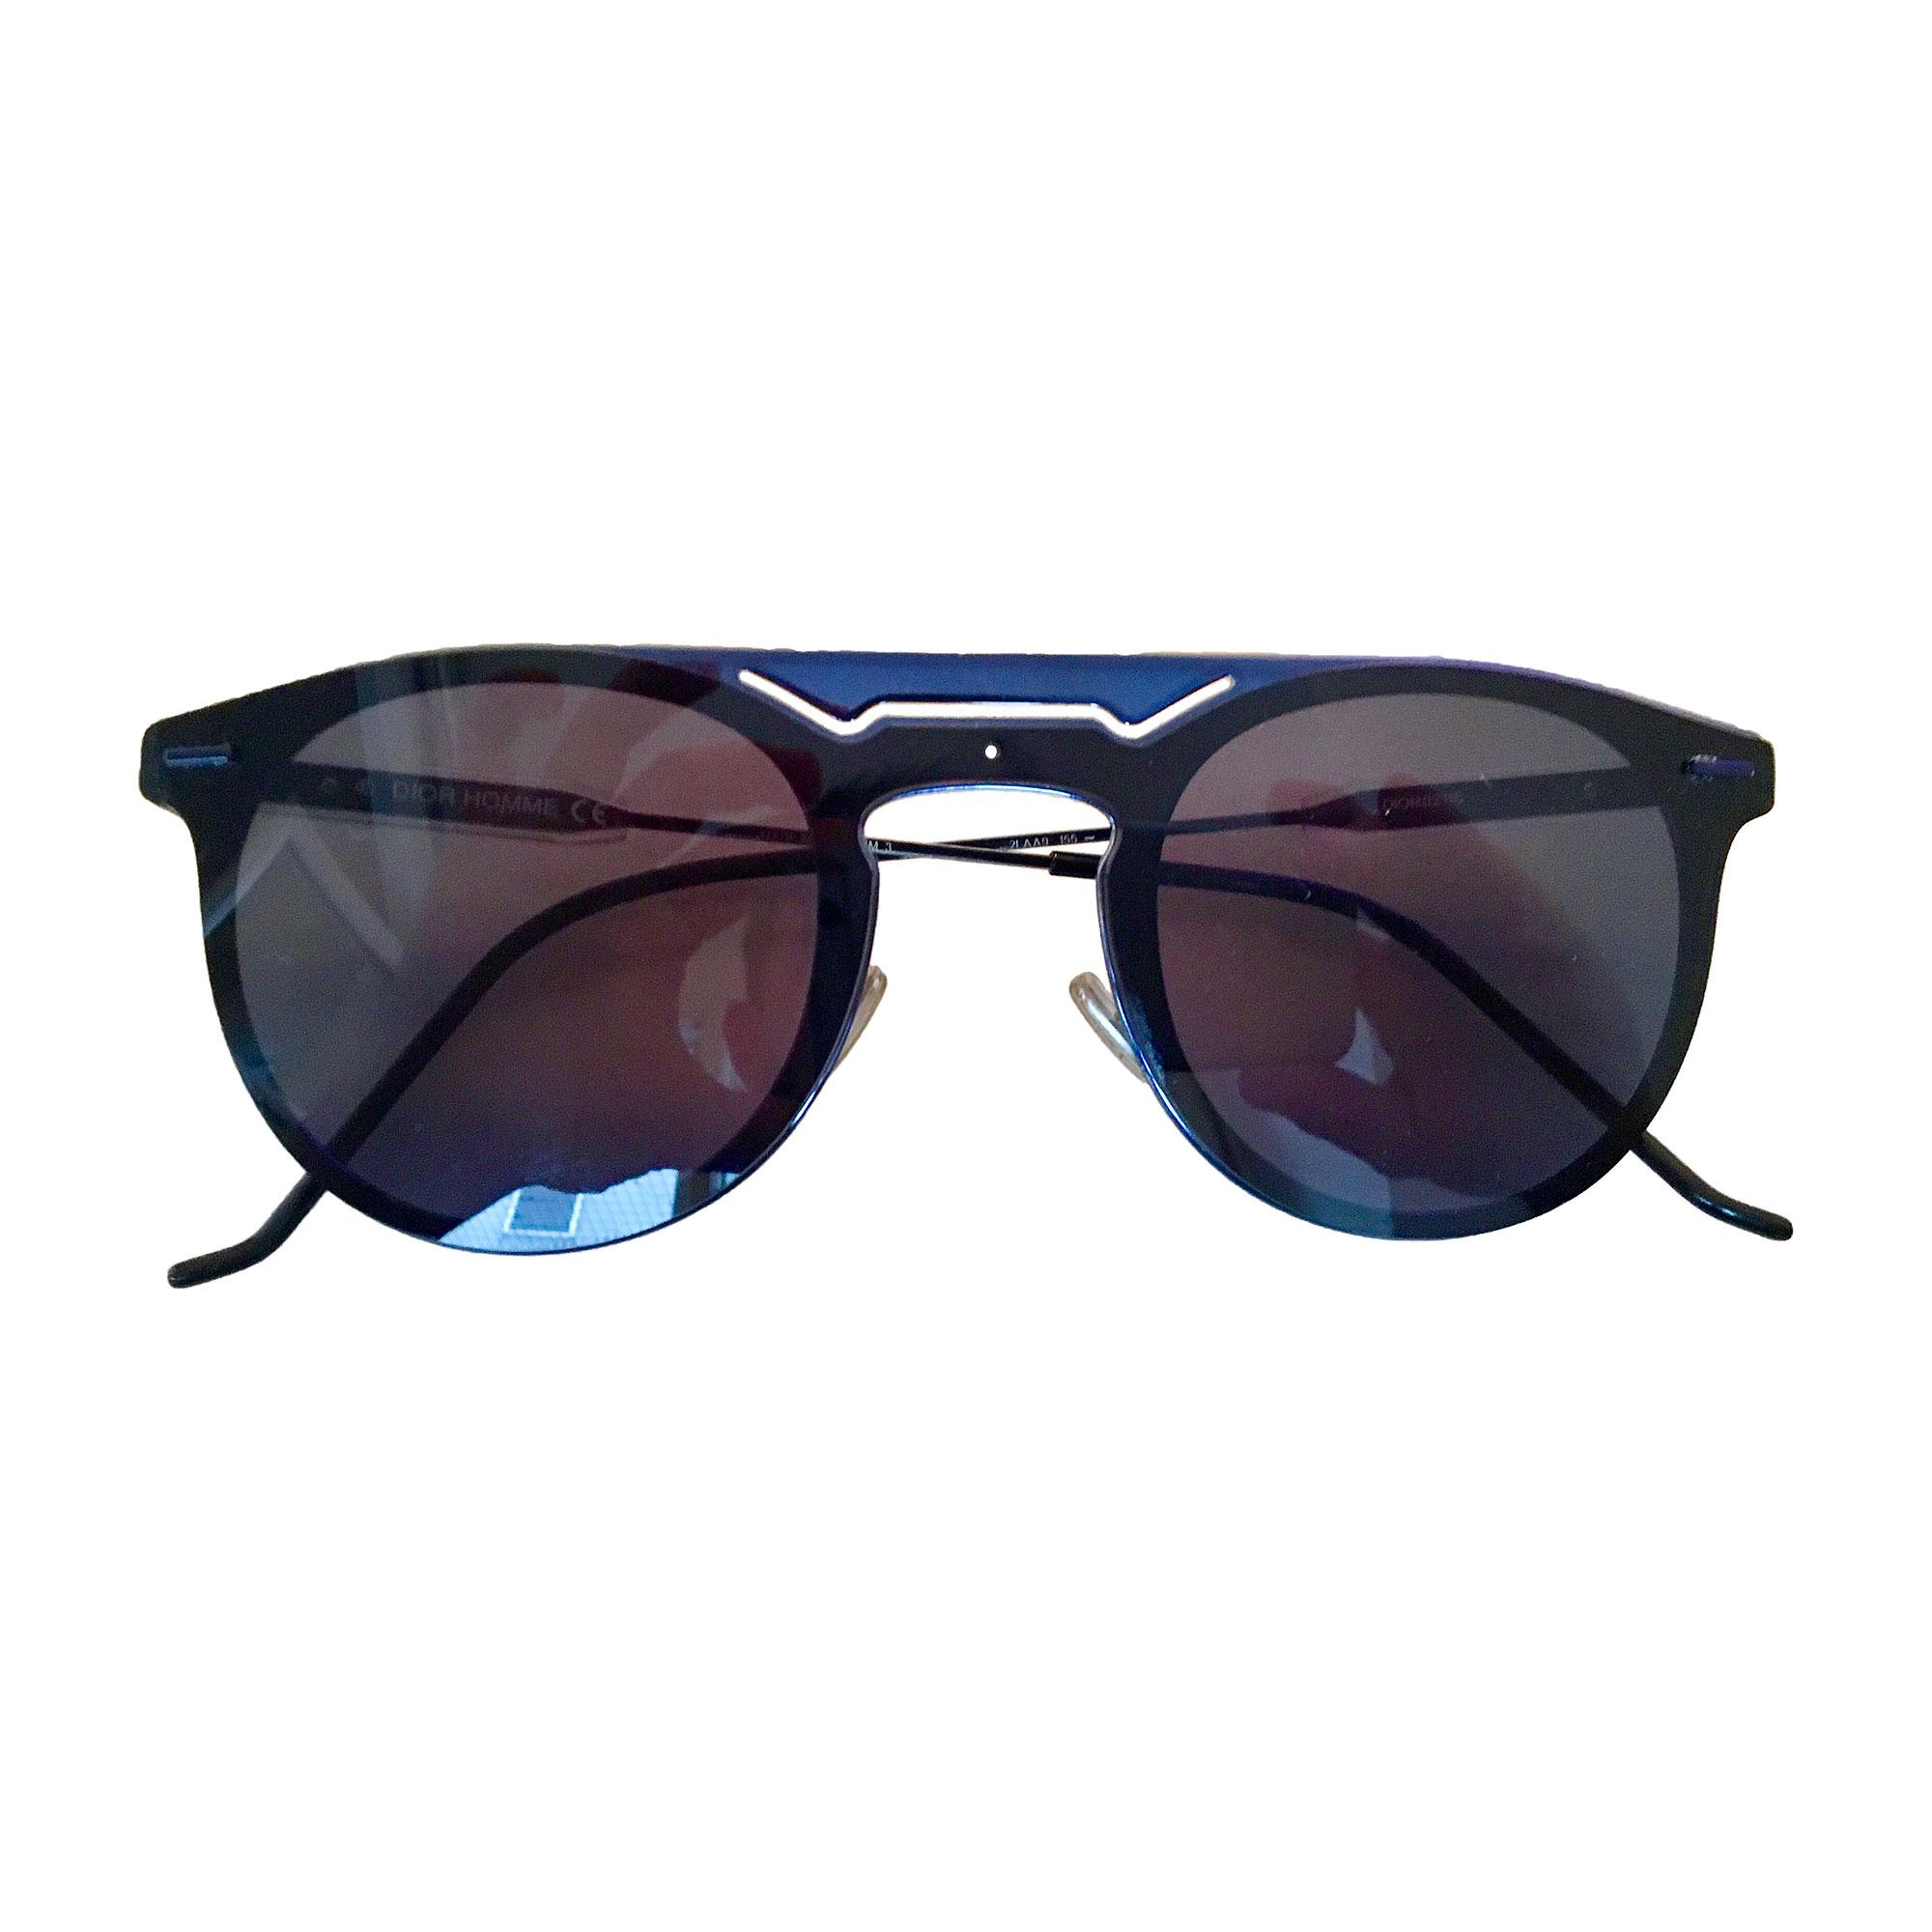 ba25e72b43dc Lunettes de soleil DIOR HOMME Bleu, bleu marine, bleu turquoise